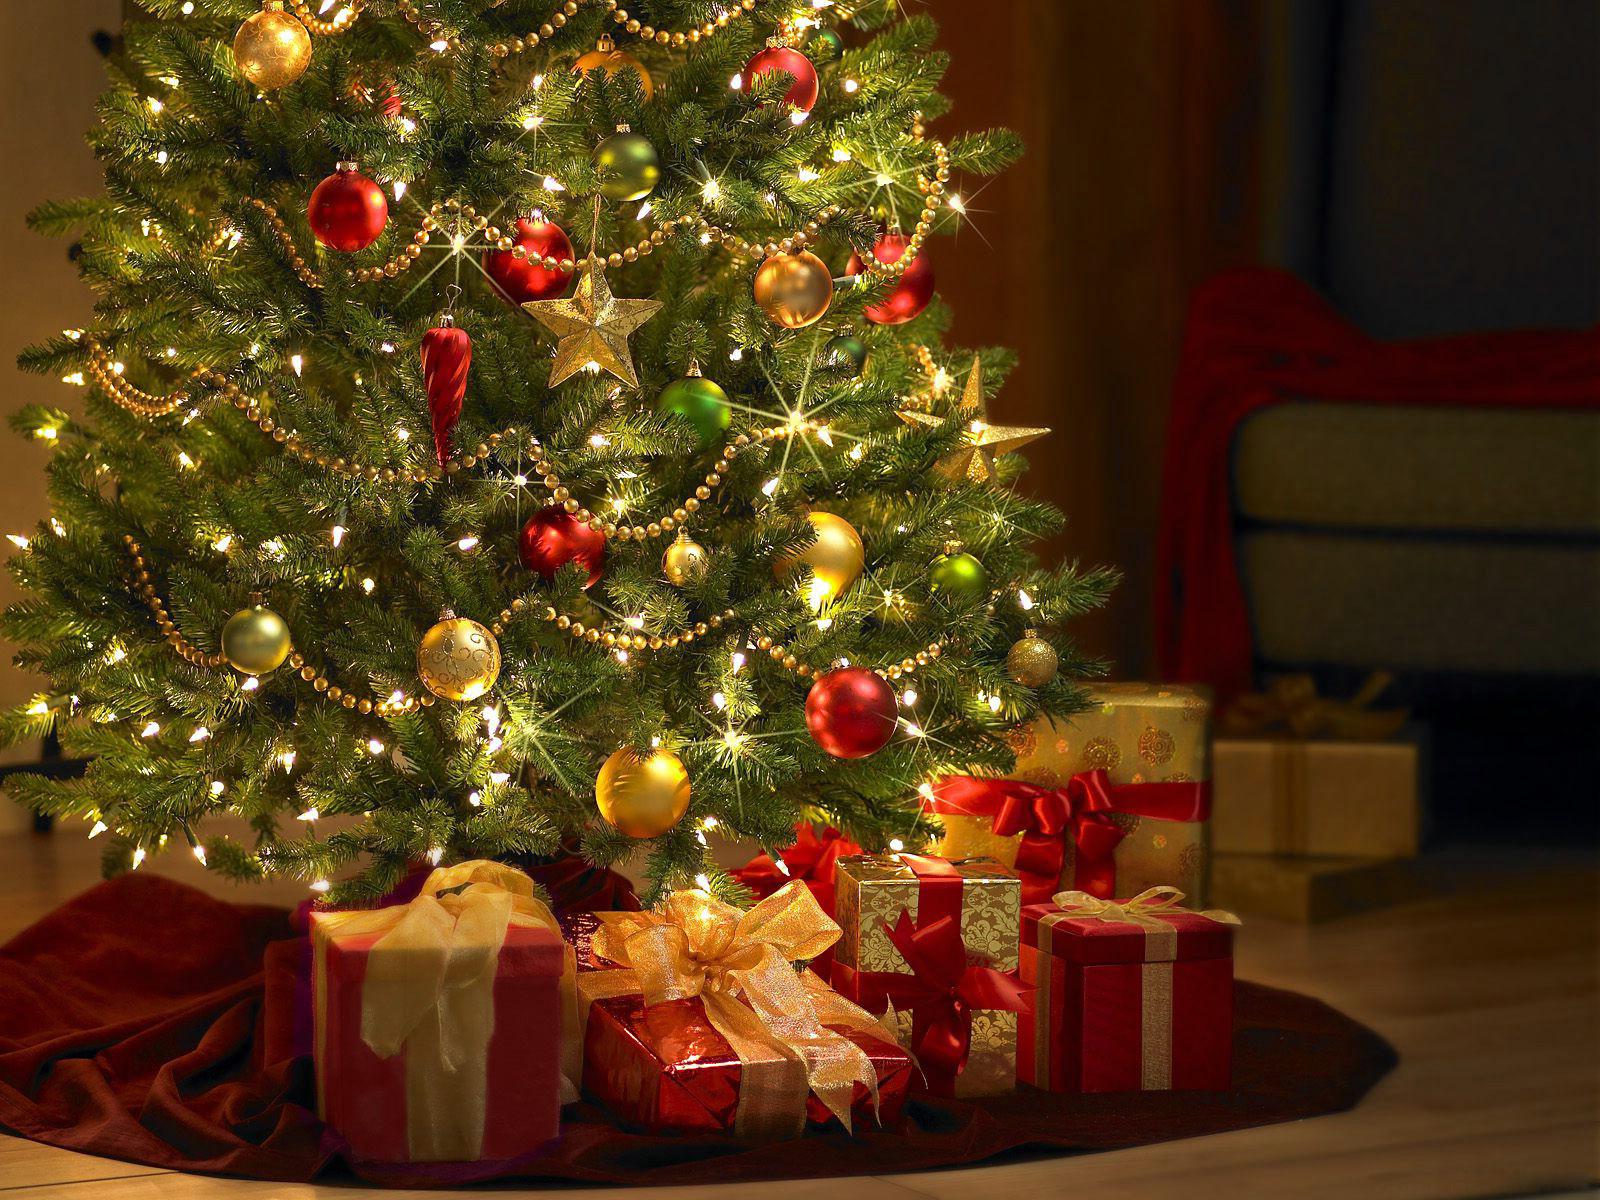 20%2BDIY%2BModern%2BChristmas%2BTree%2BDecorations%2Bfor%2BInspiring%2BWinter%2BHolidays%2B%252816%2529 20 DIY Trendy Christmas Tree Decorations for Inspiring Iciness Vacations Interior